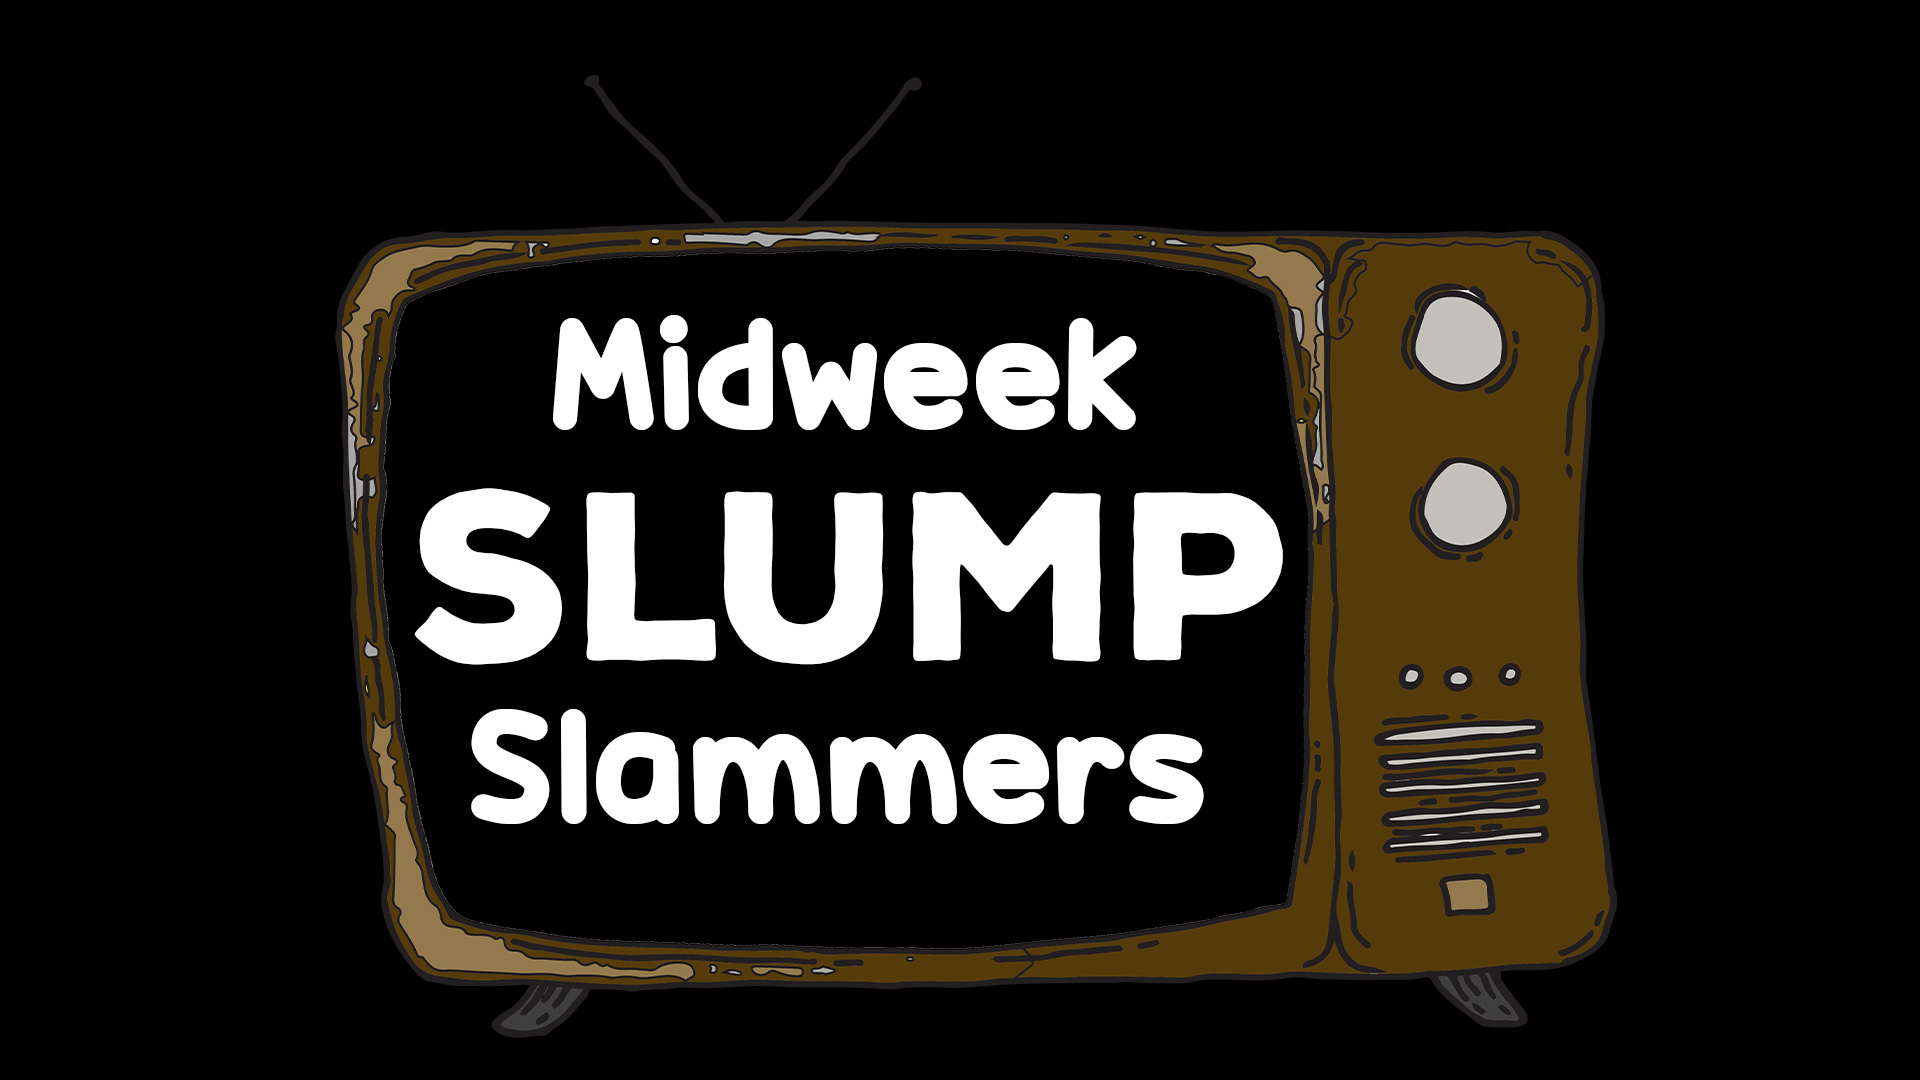 Midweek slump slammers: Roundup #3